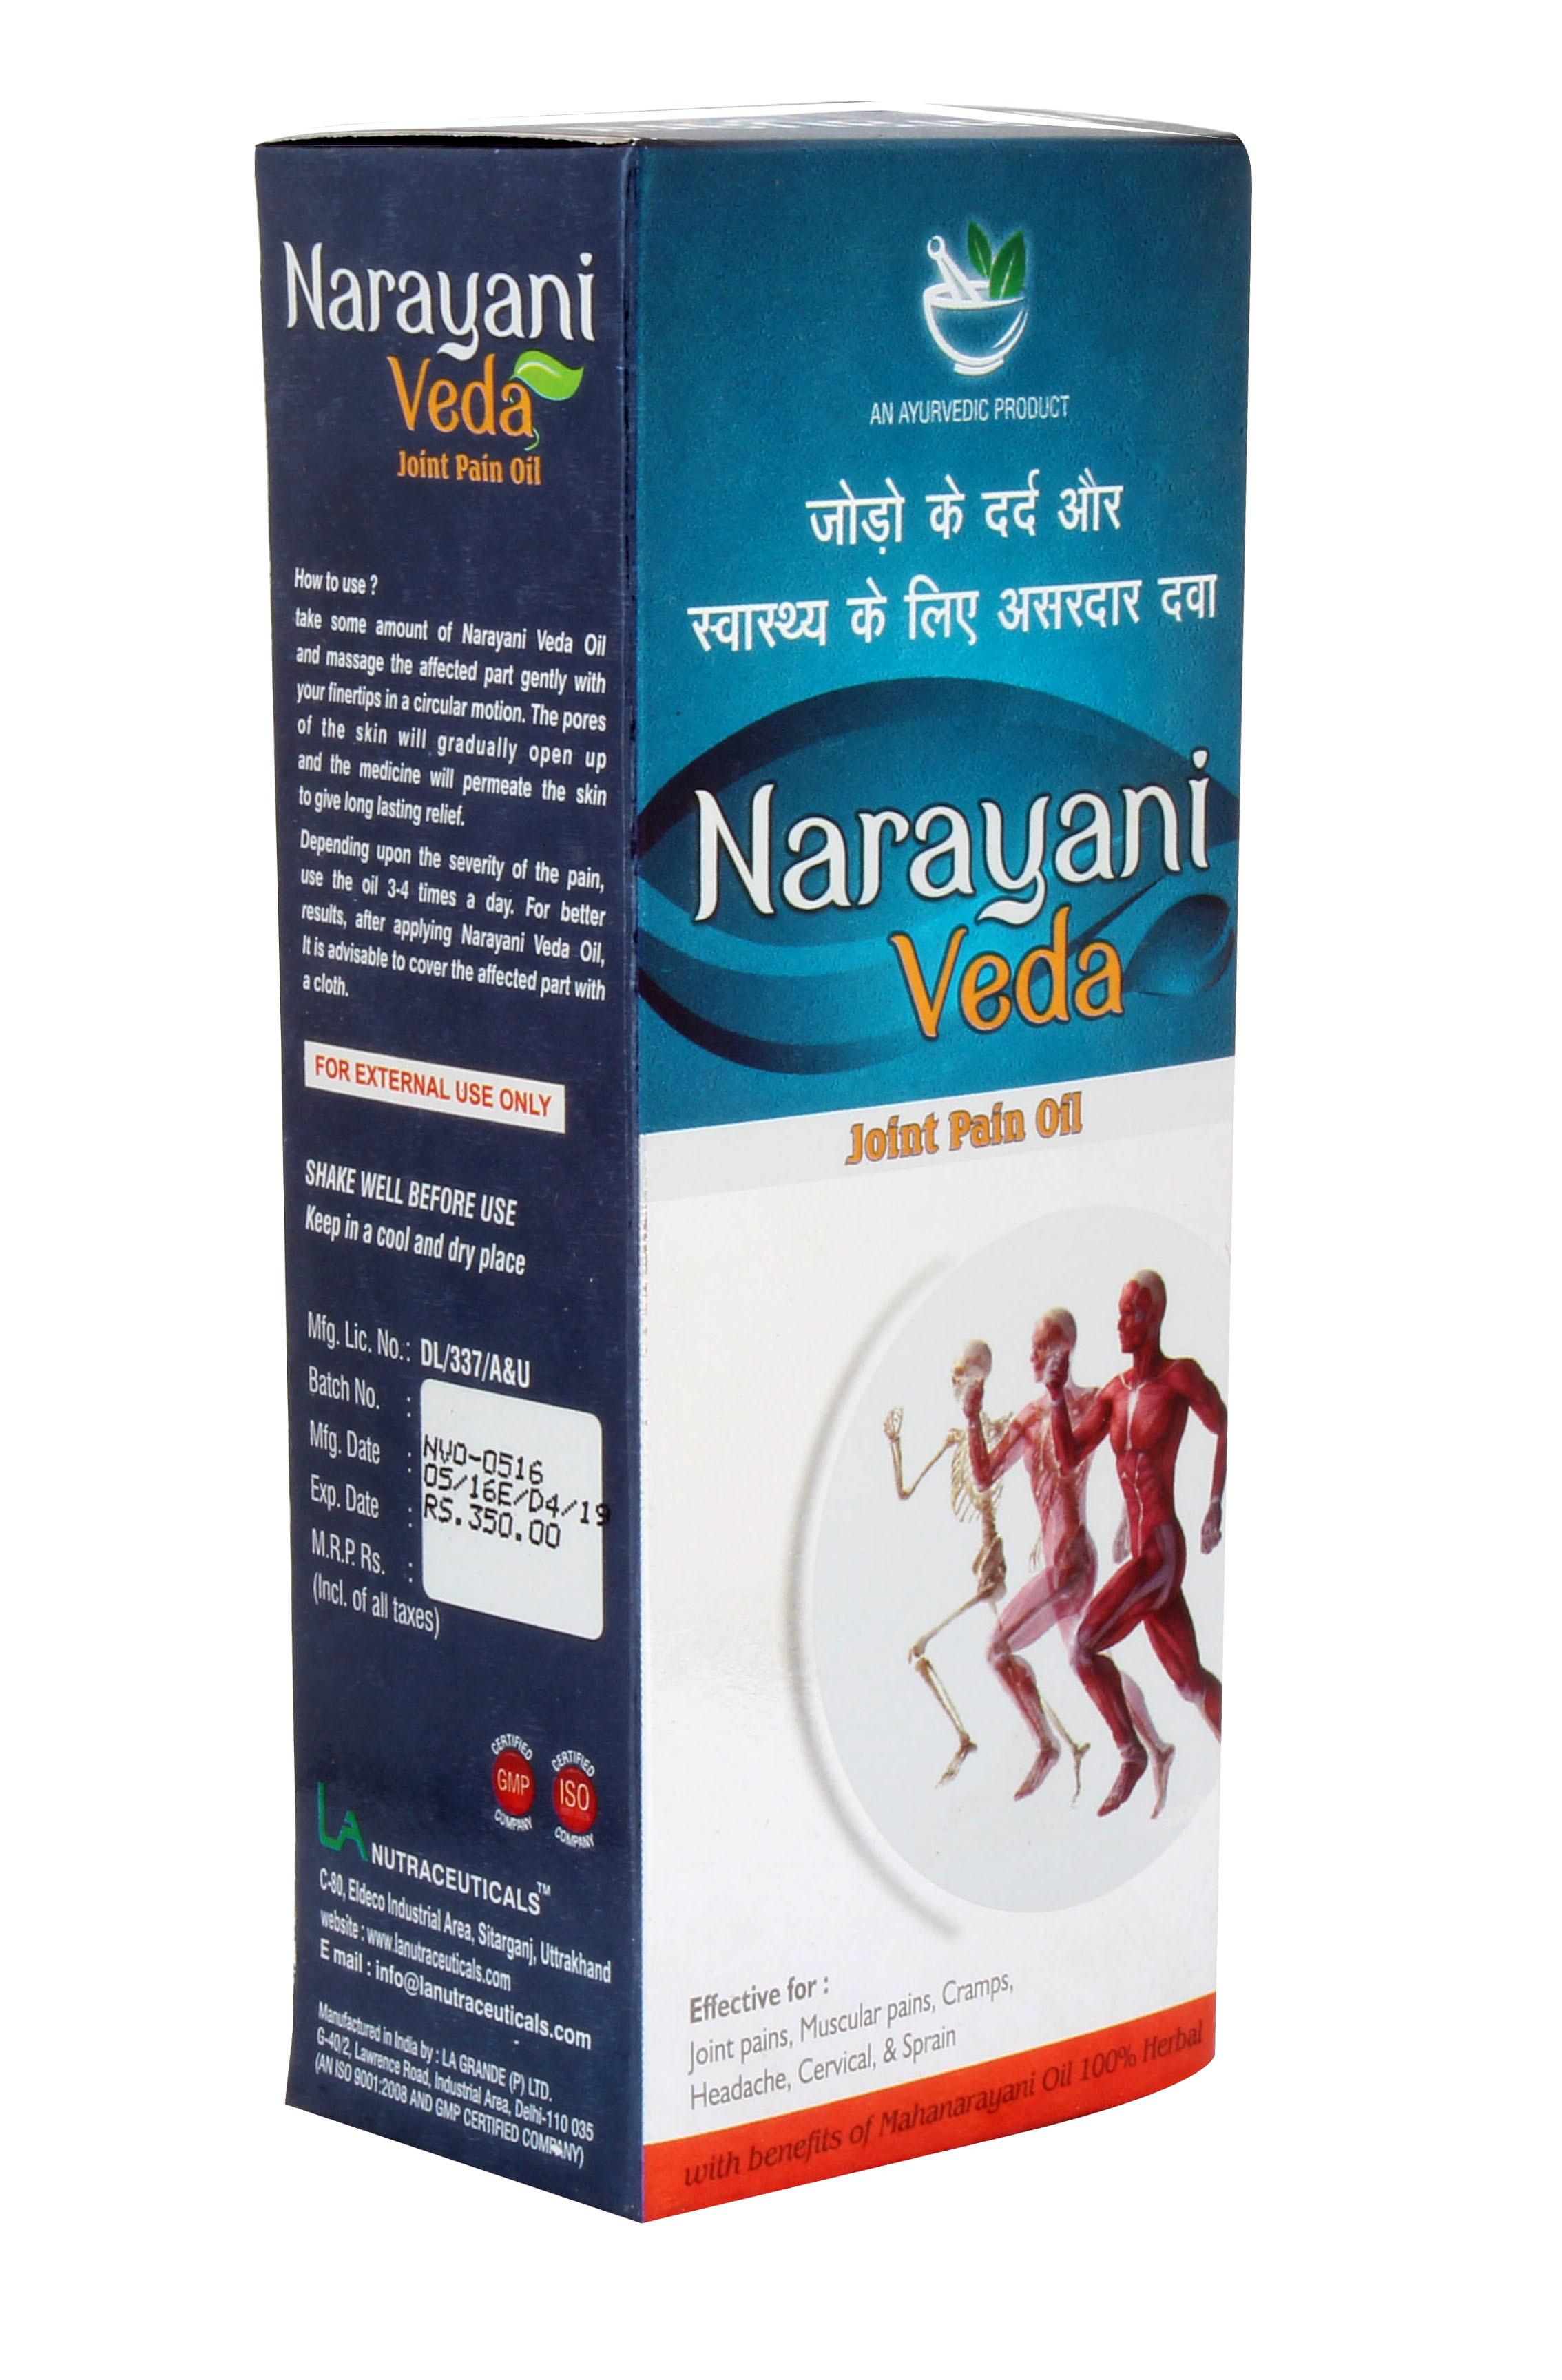 Narayanini Veda Oil